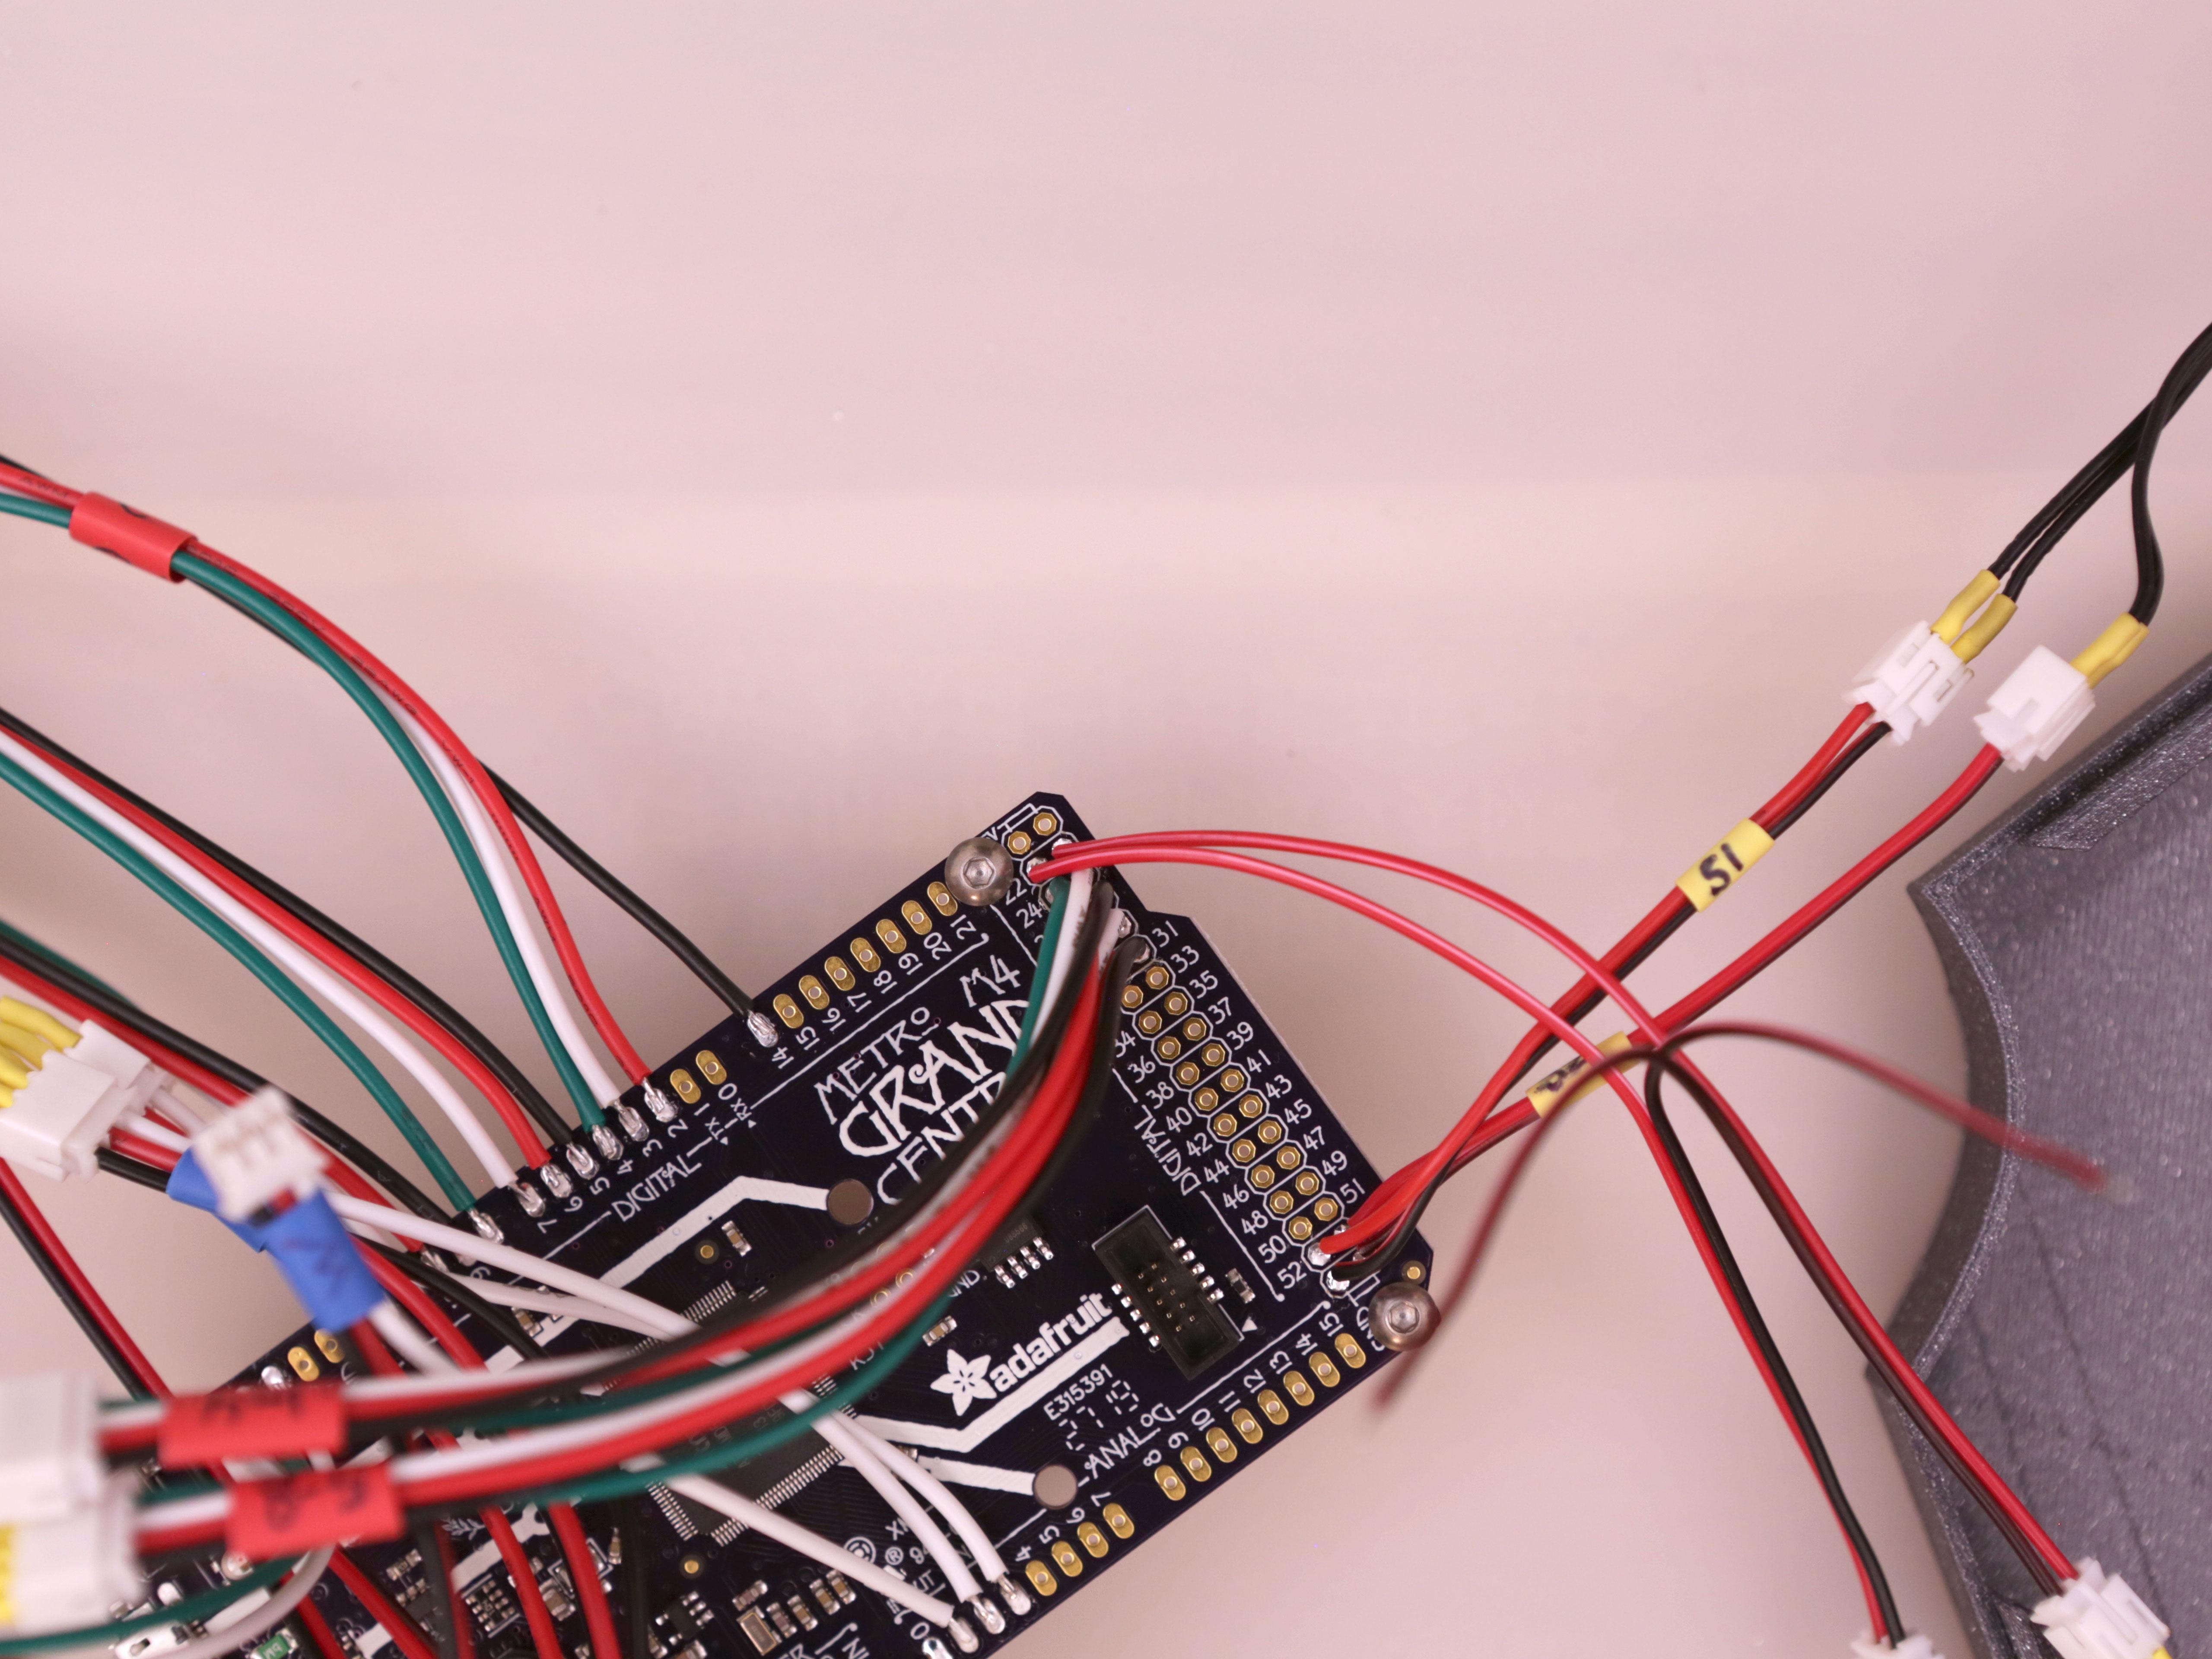 3d_printing_m4-tswitch-wire.jpg